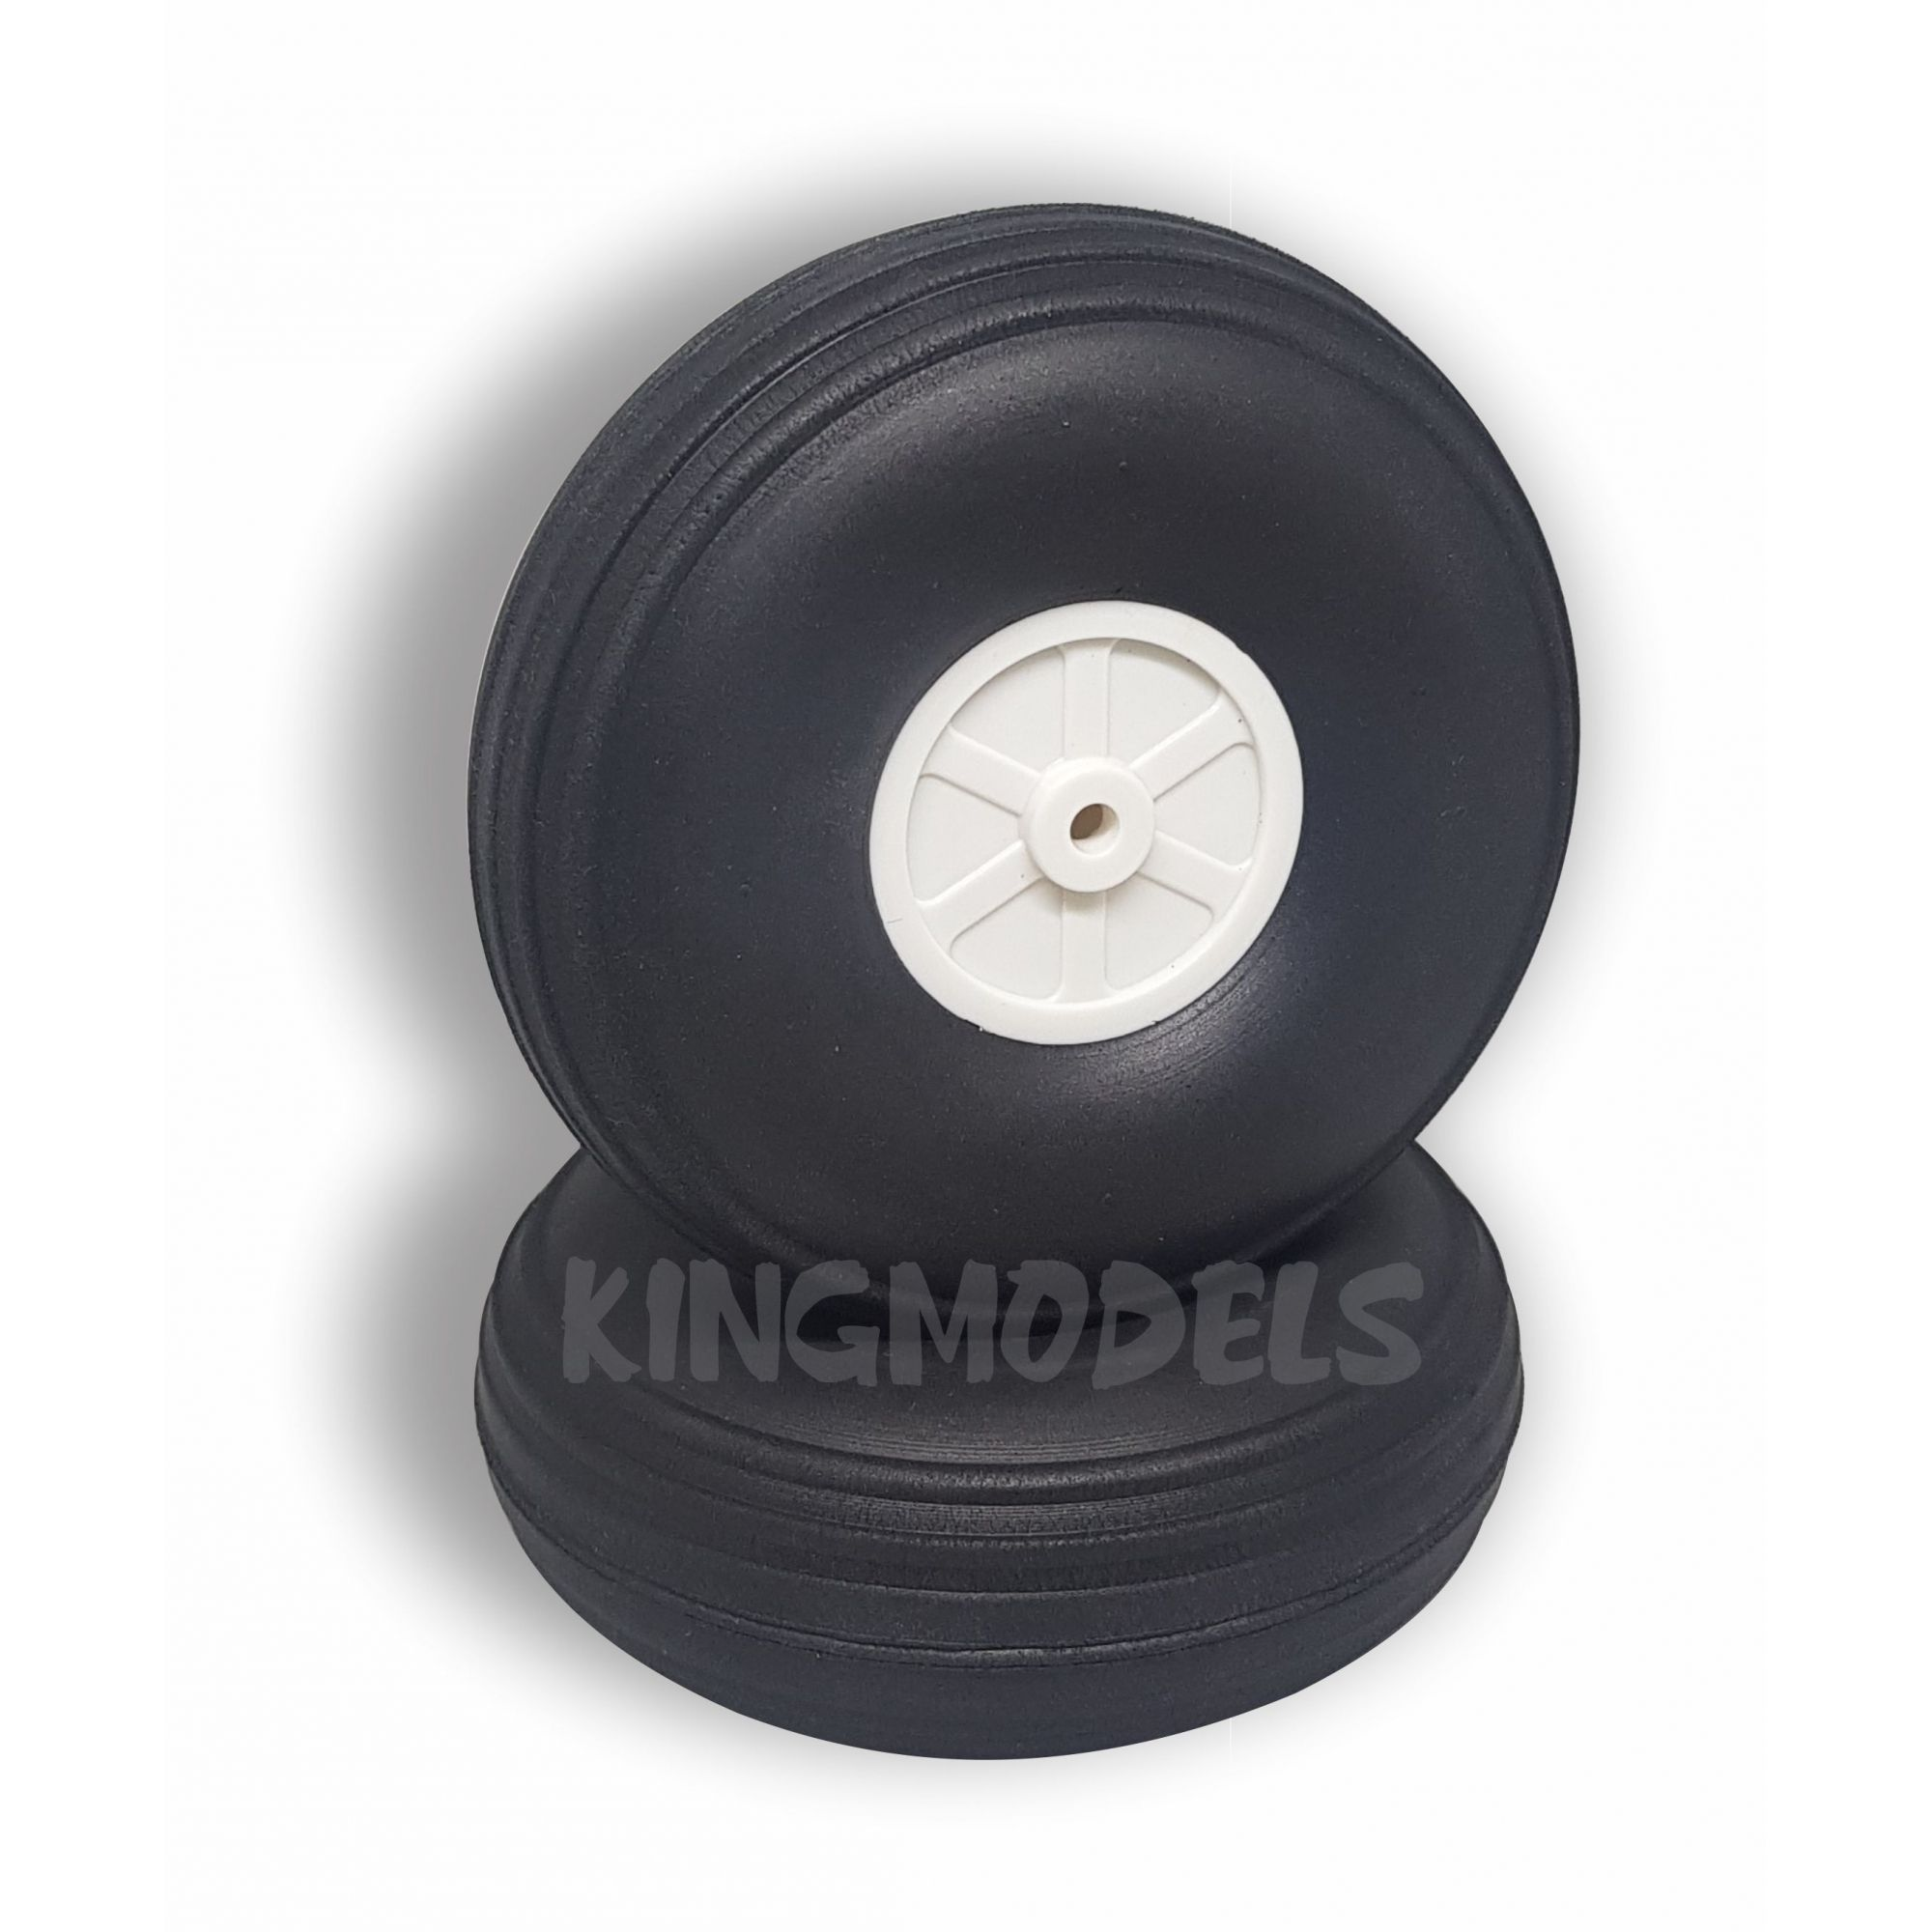 Roda De Borracha Extra-leve E Cubo Nylon- 57mm - (2pçs)  - King Models